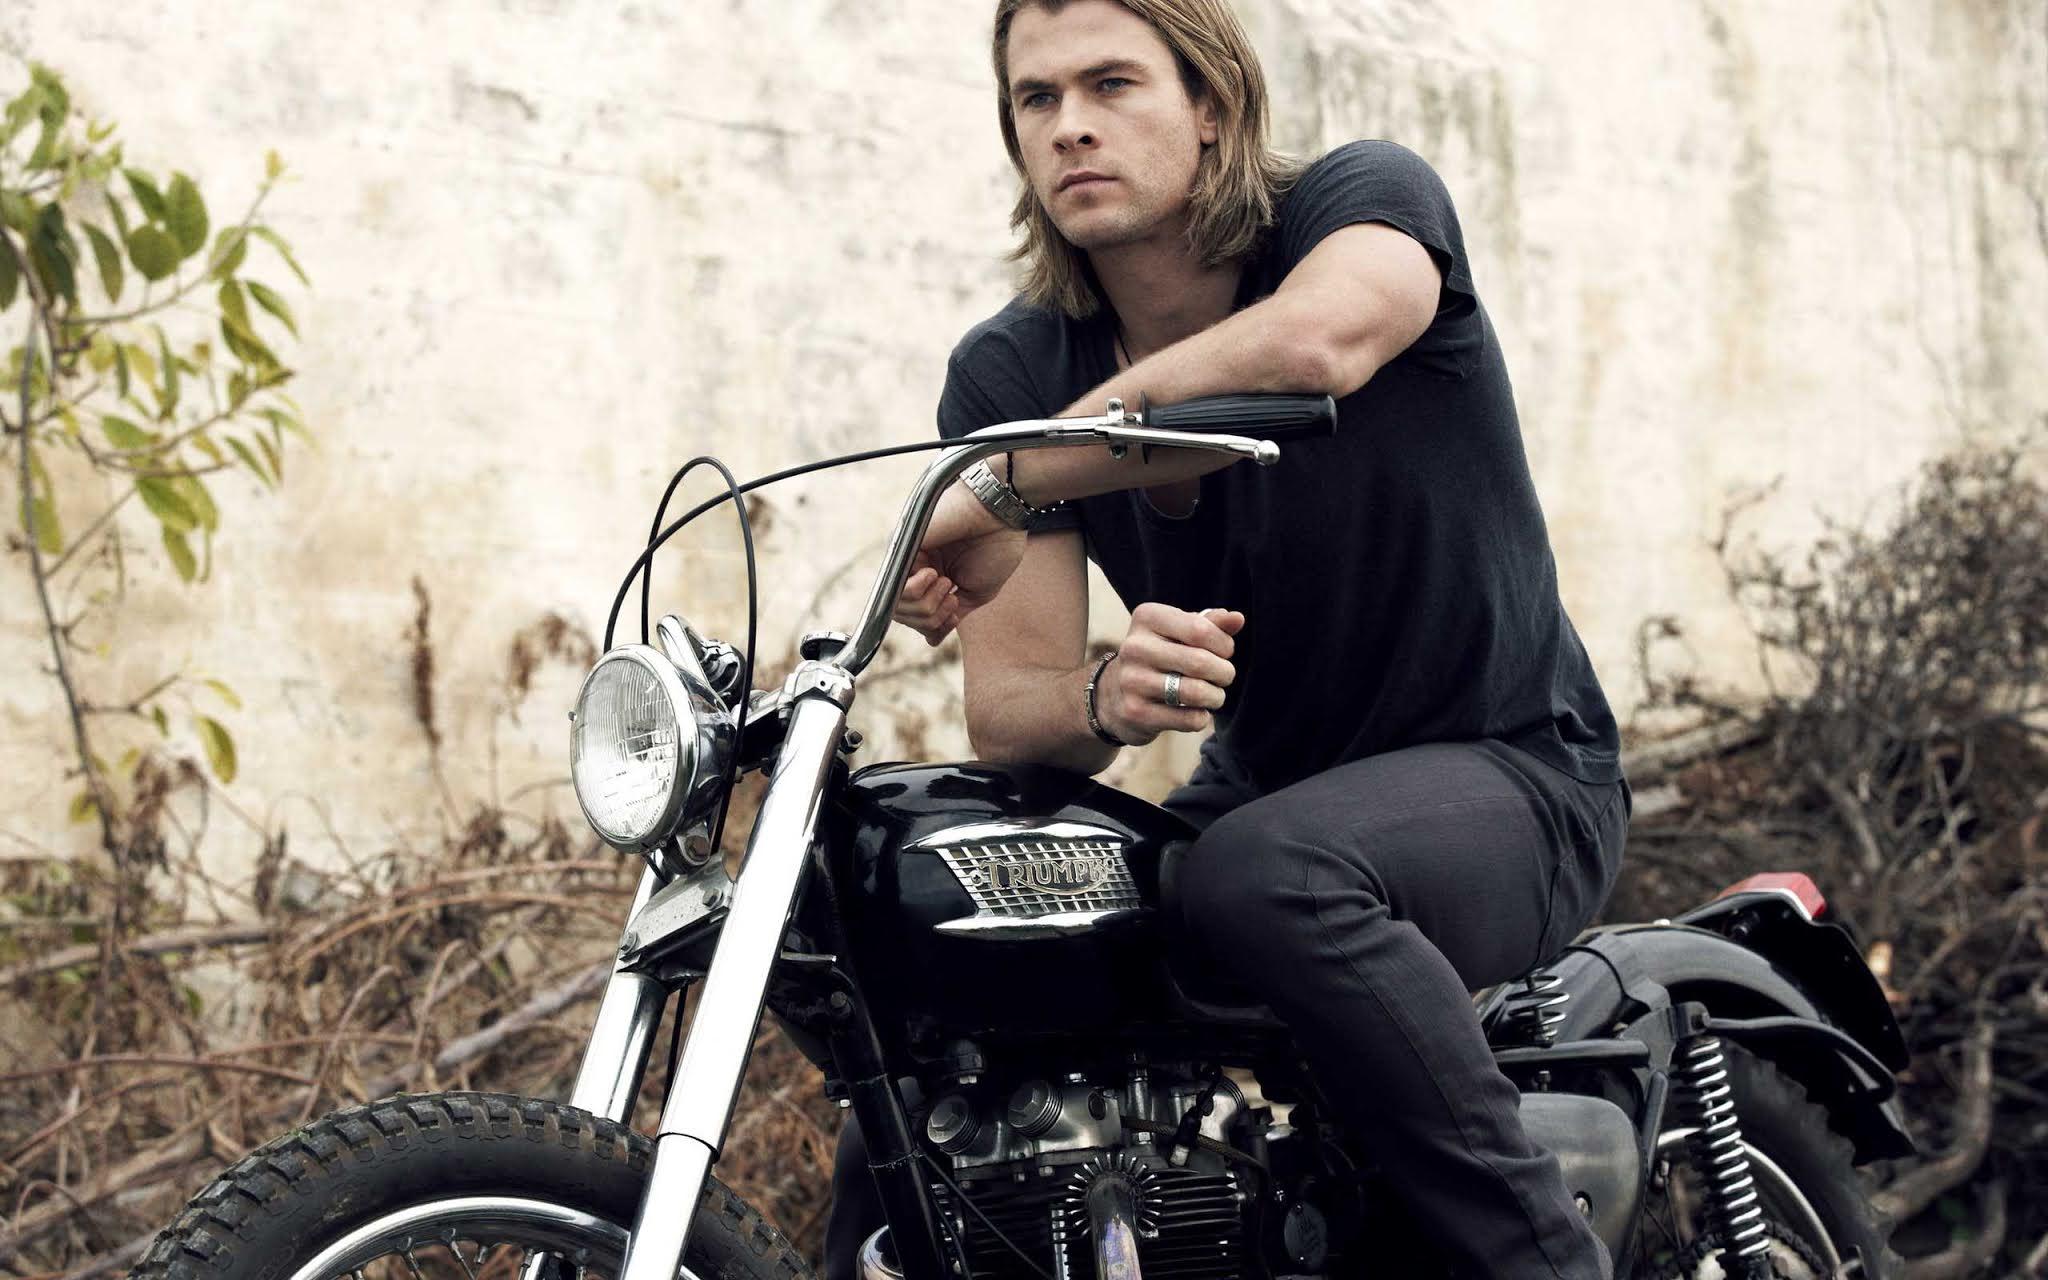 Chris Hemsworth in BIke